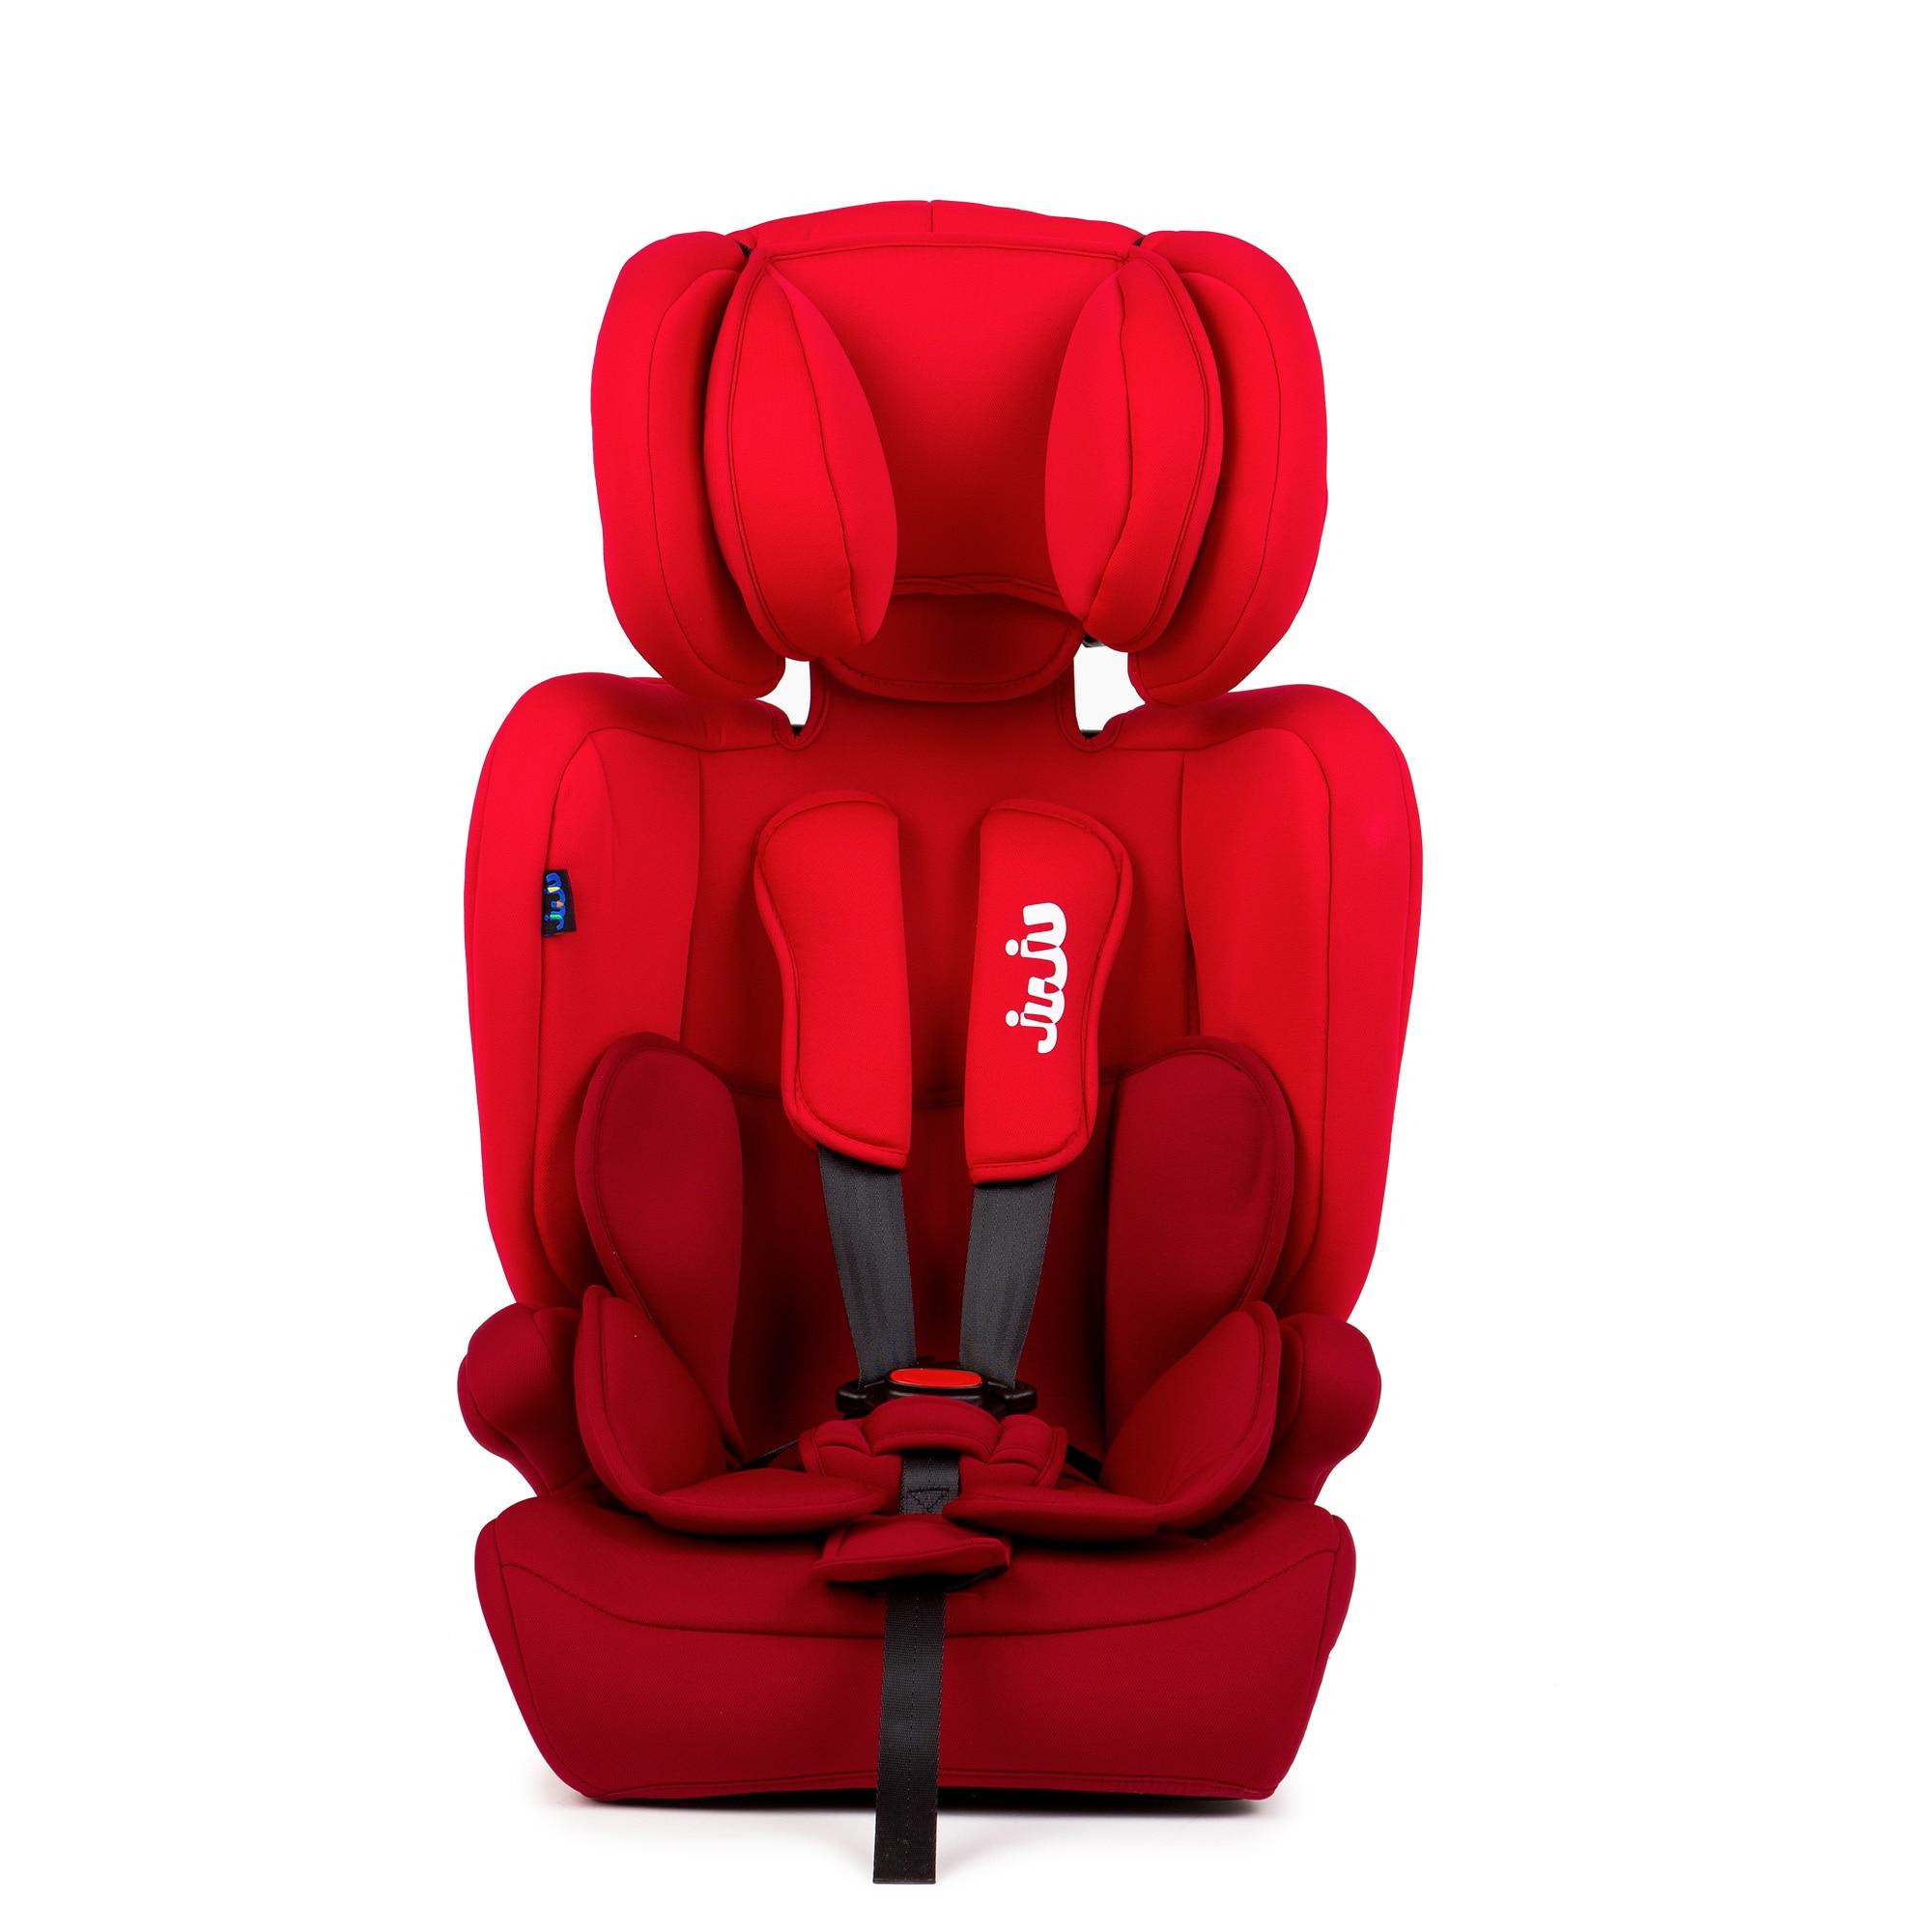 Fotografie Scaun auto Juju Safe Rider, 9-36 kg, Rosu/Bordo